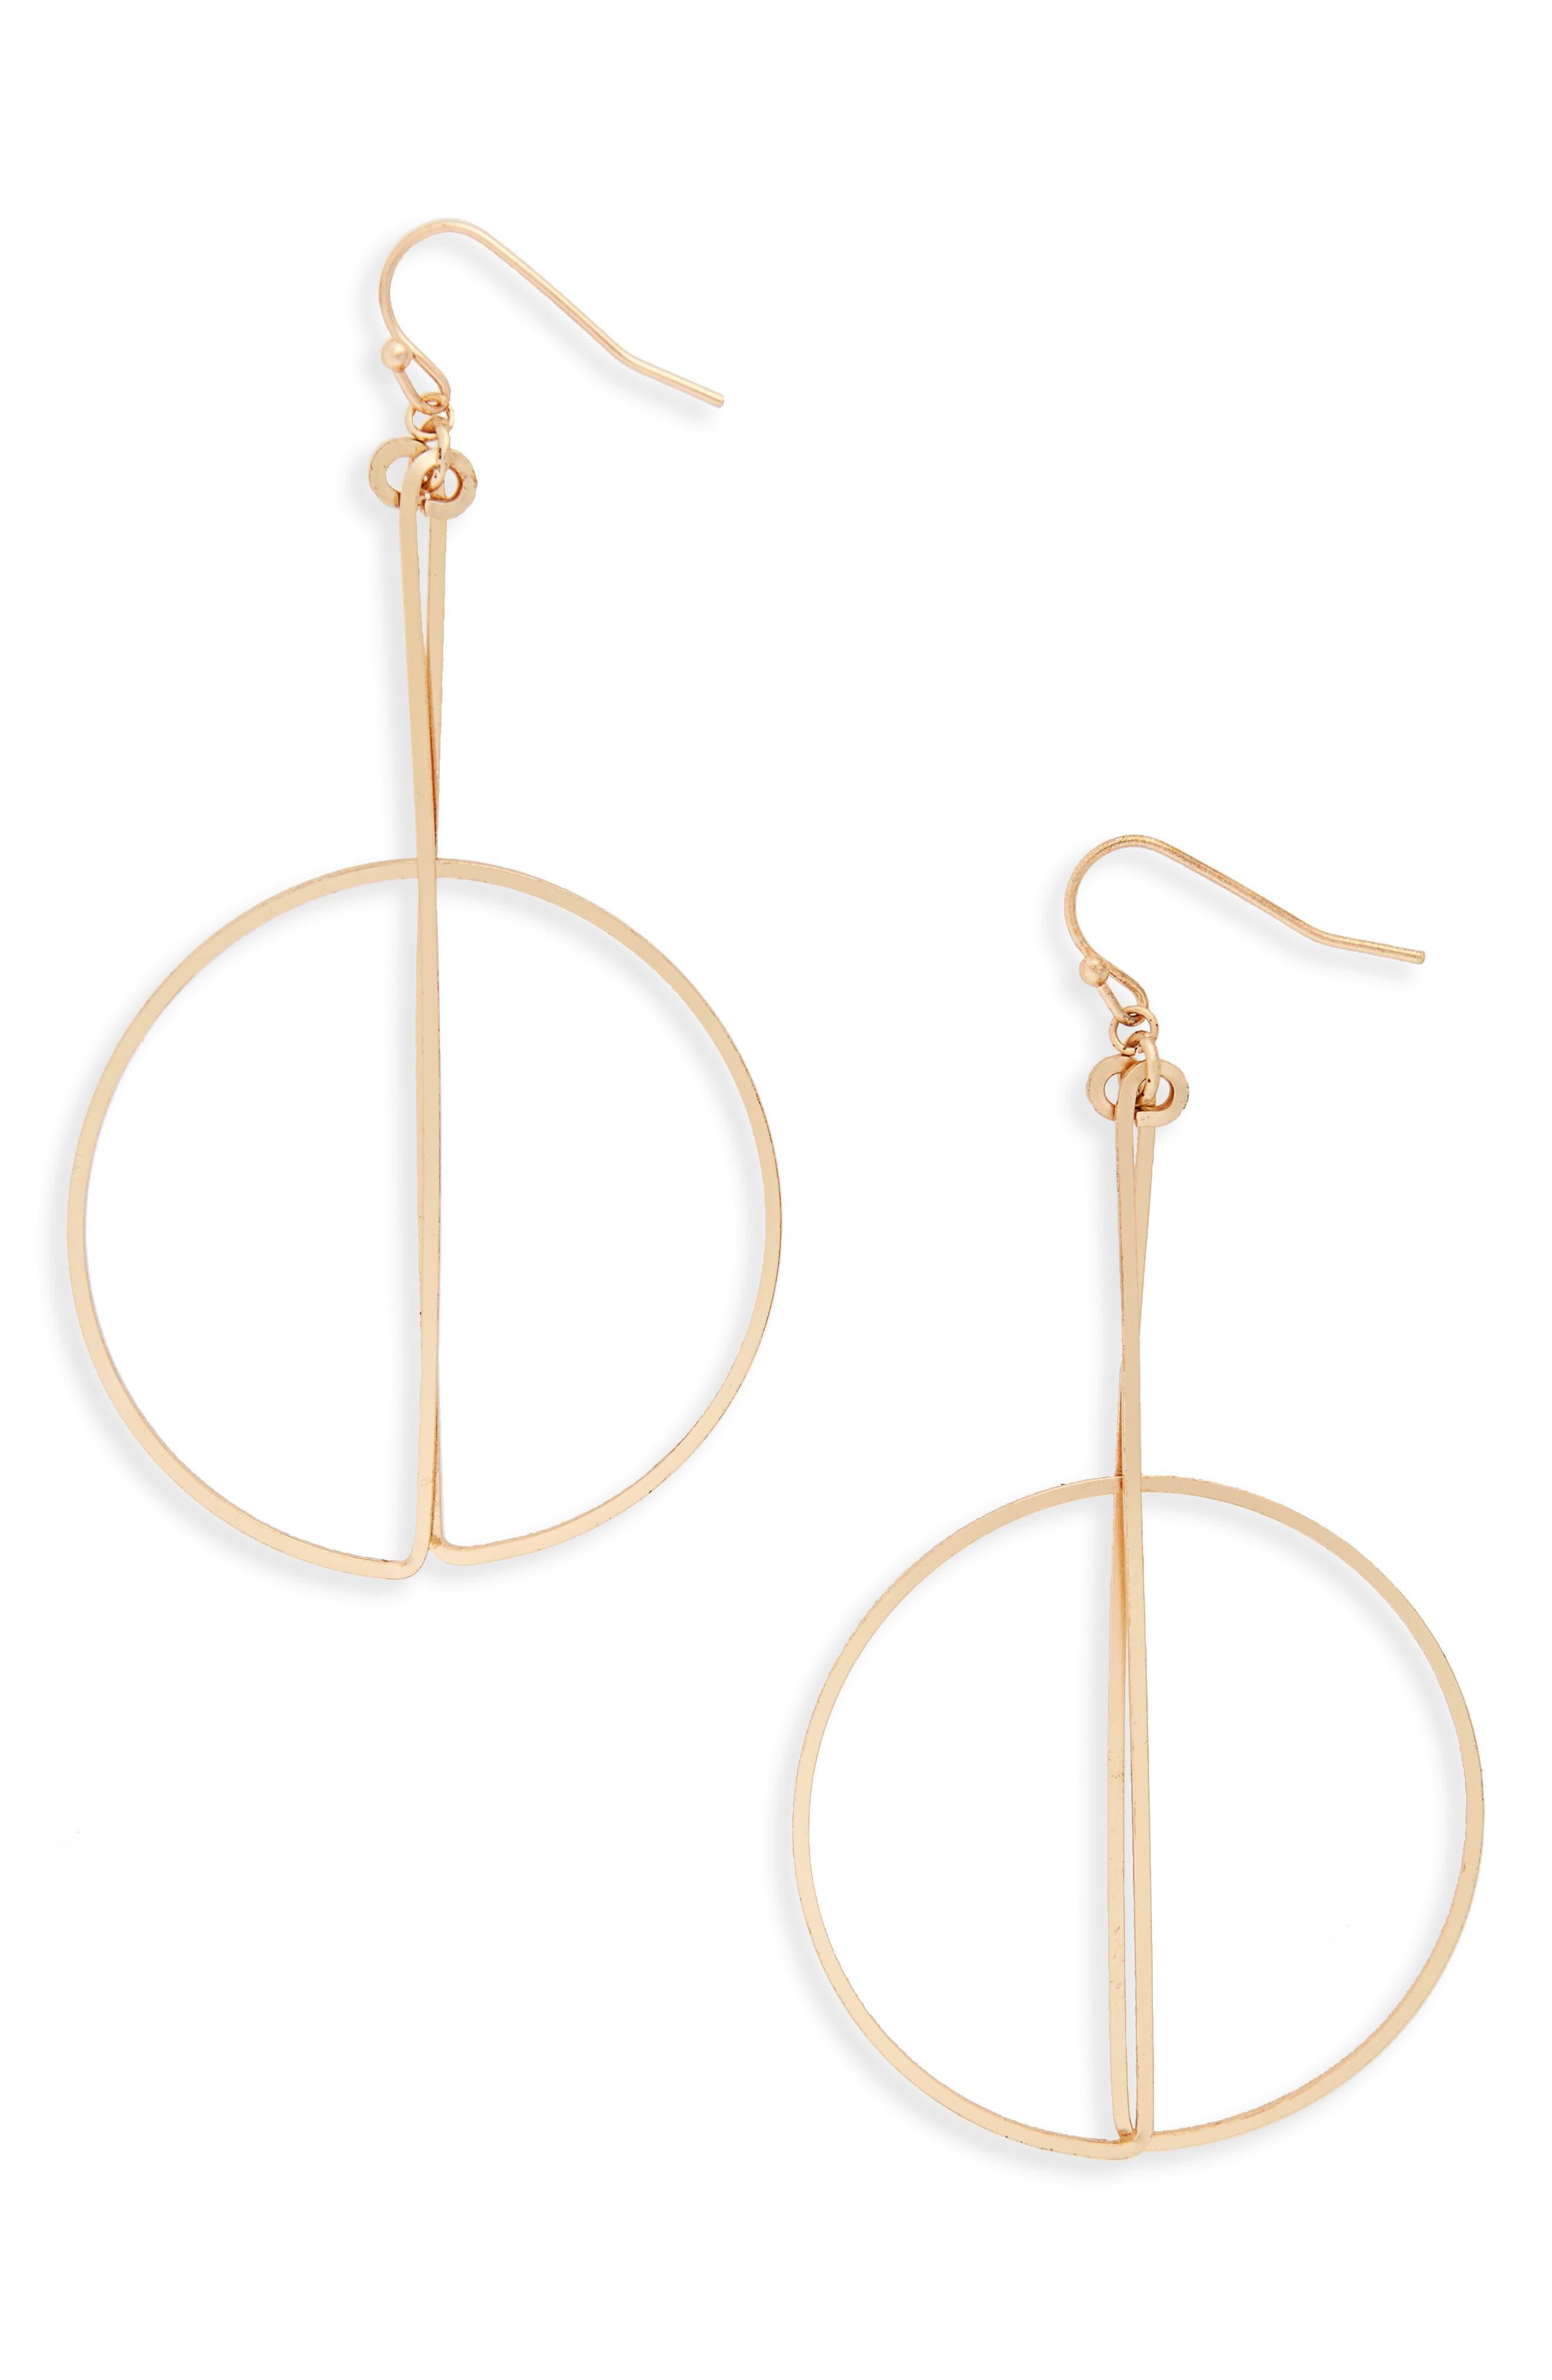 Main Image - BP. Circle and Bar Earrings